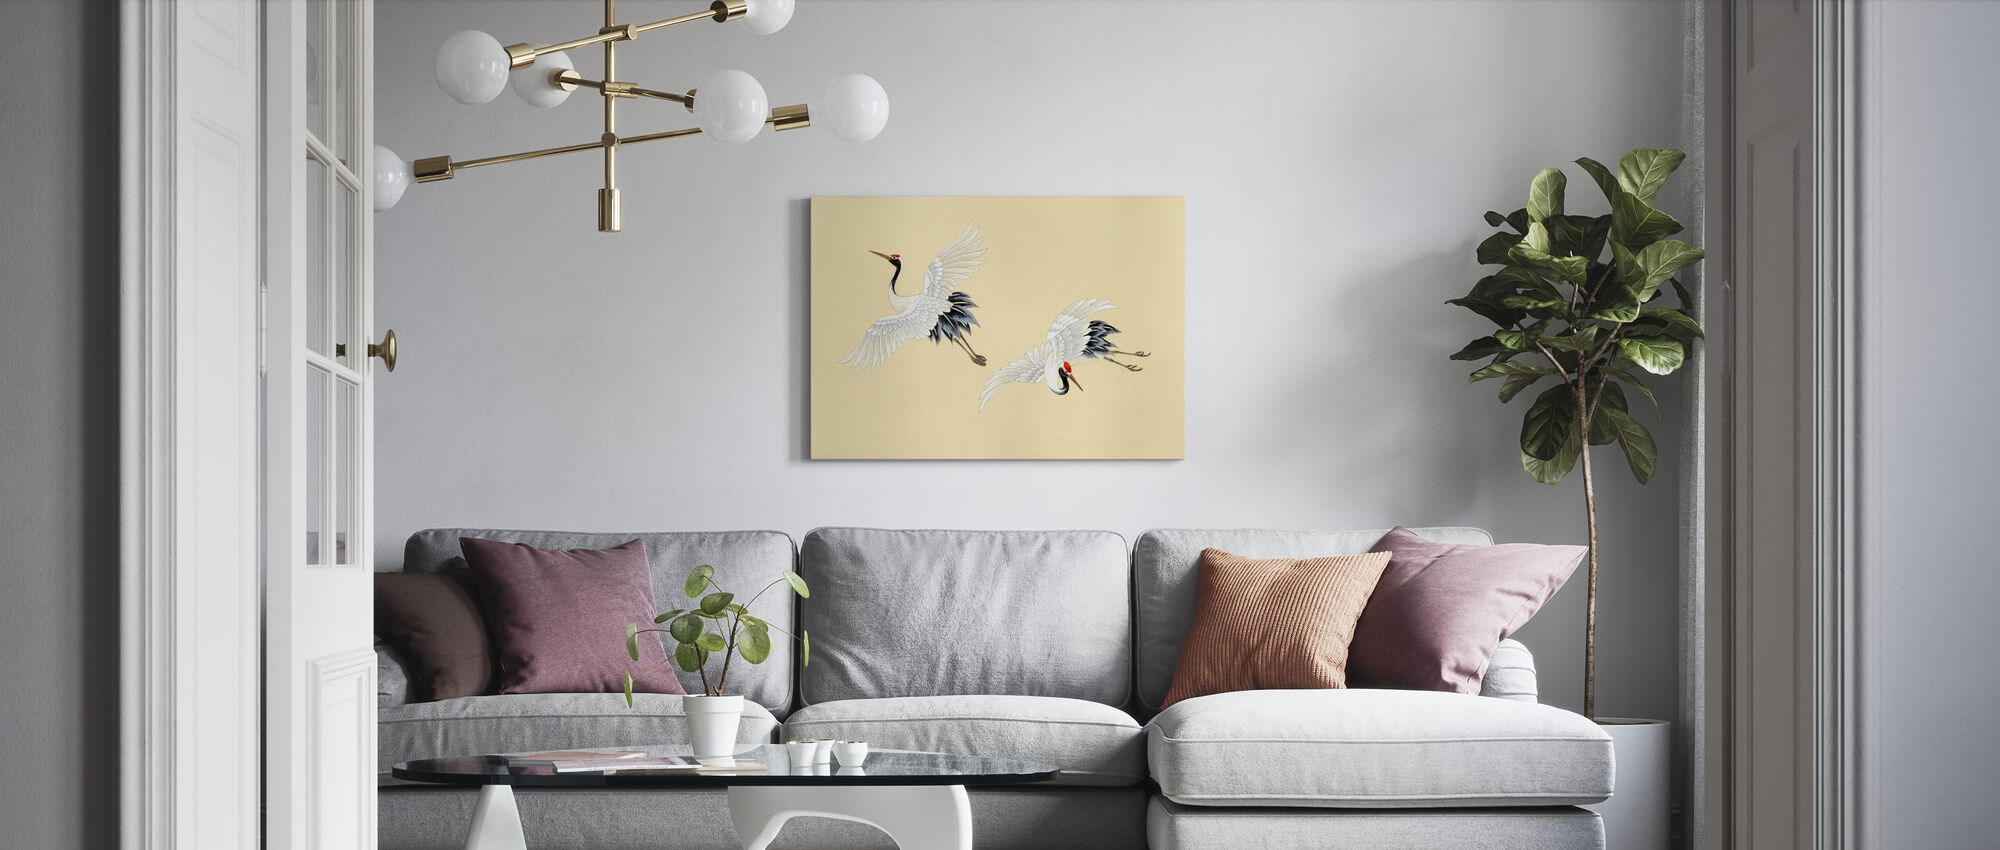 Two Cranes - Canvas print - Living Room